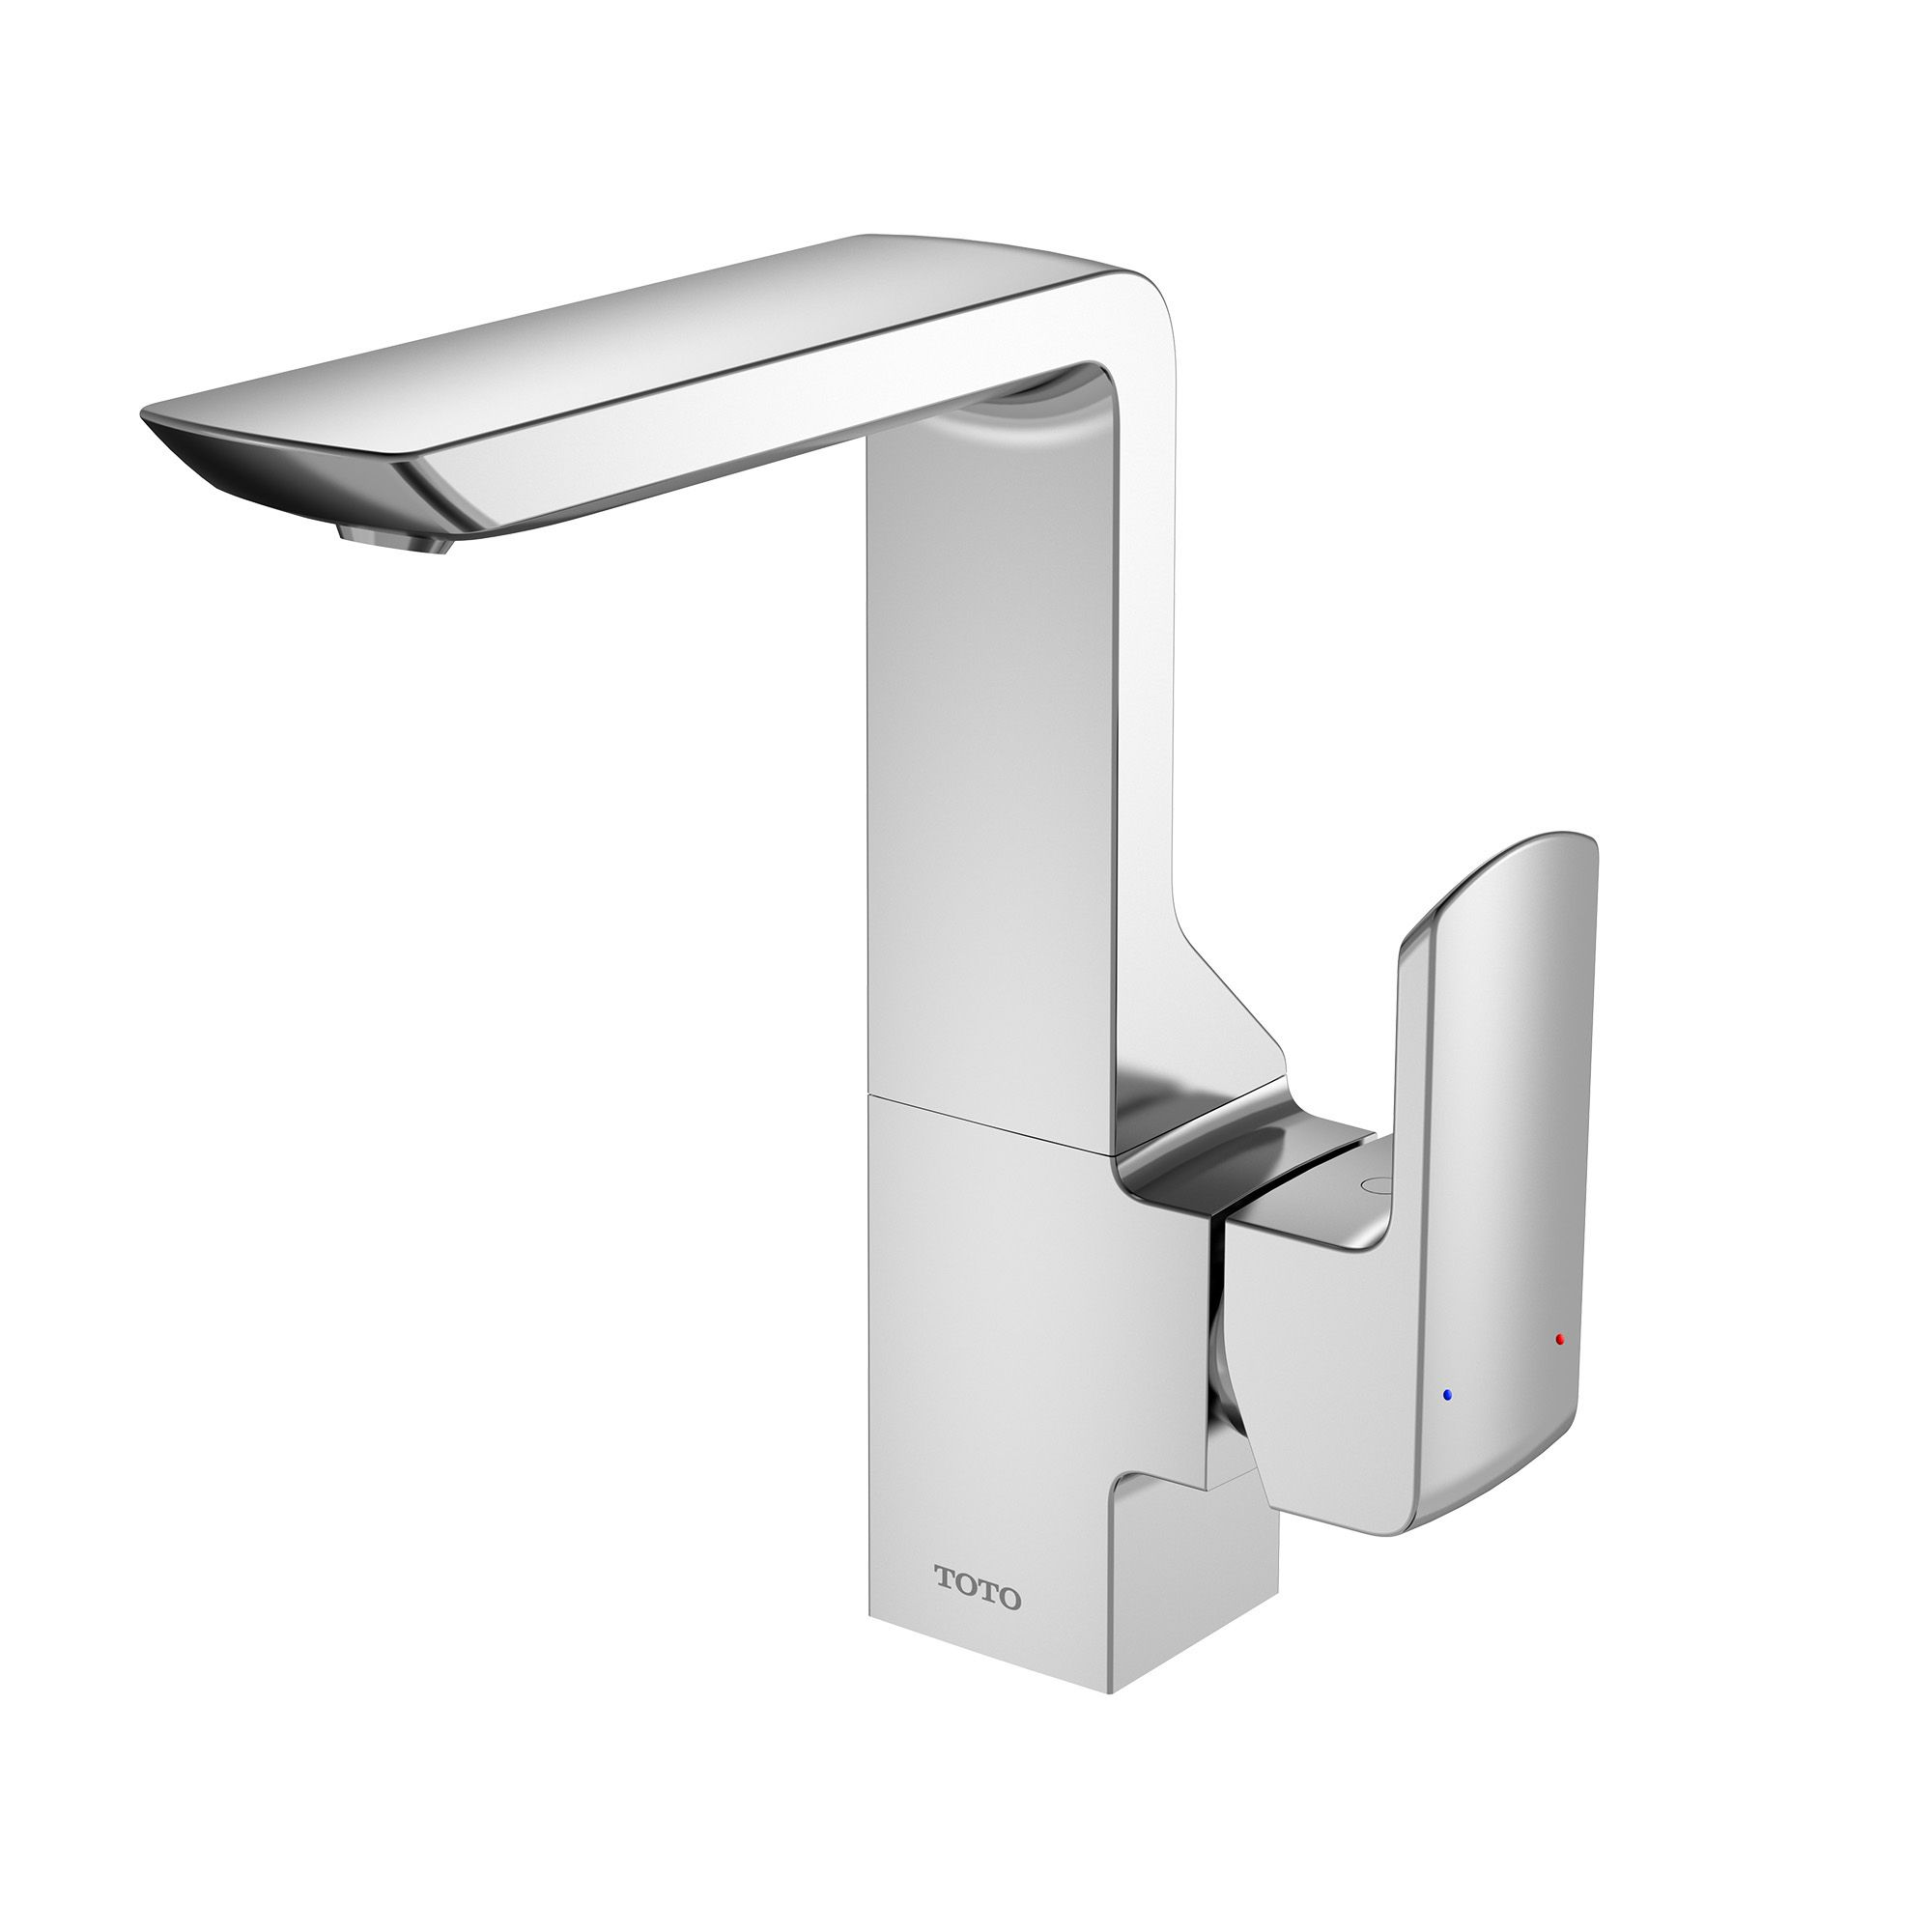 Awe Inspiring Toto Gr 1 2 Gpm Single Side Handle Bathroom Sink Faucet With Beutiful Home Inspiration Semekurdistantinfo